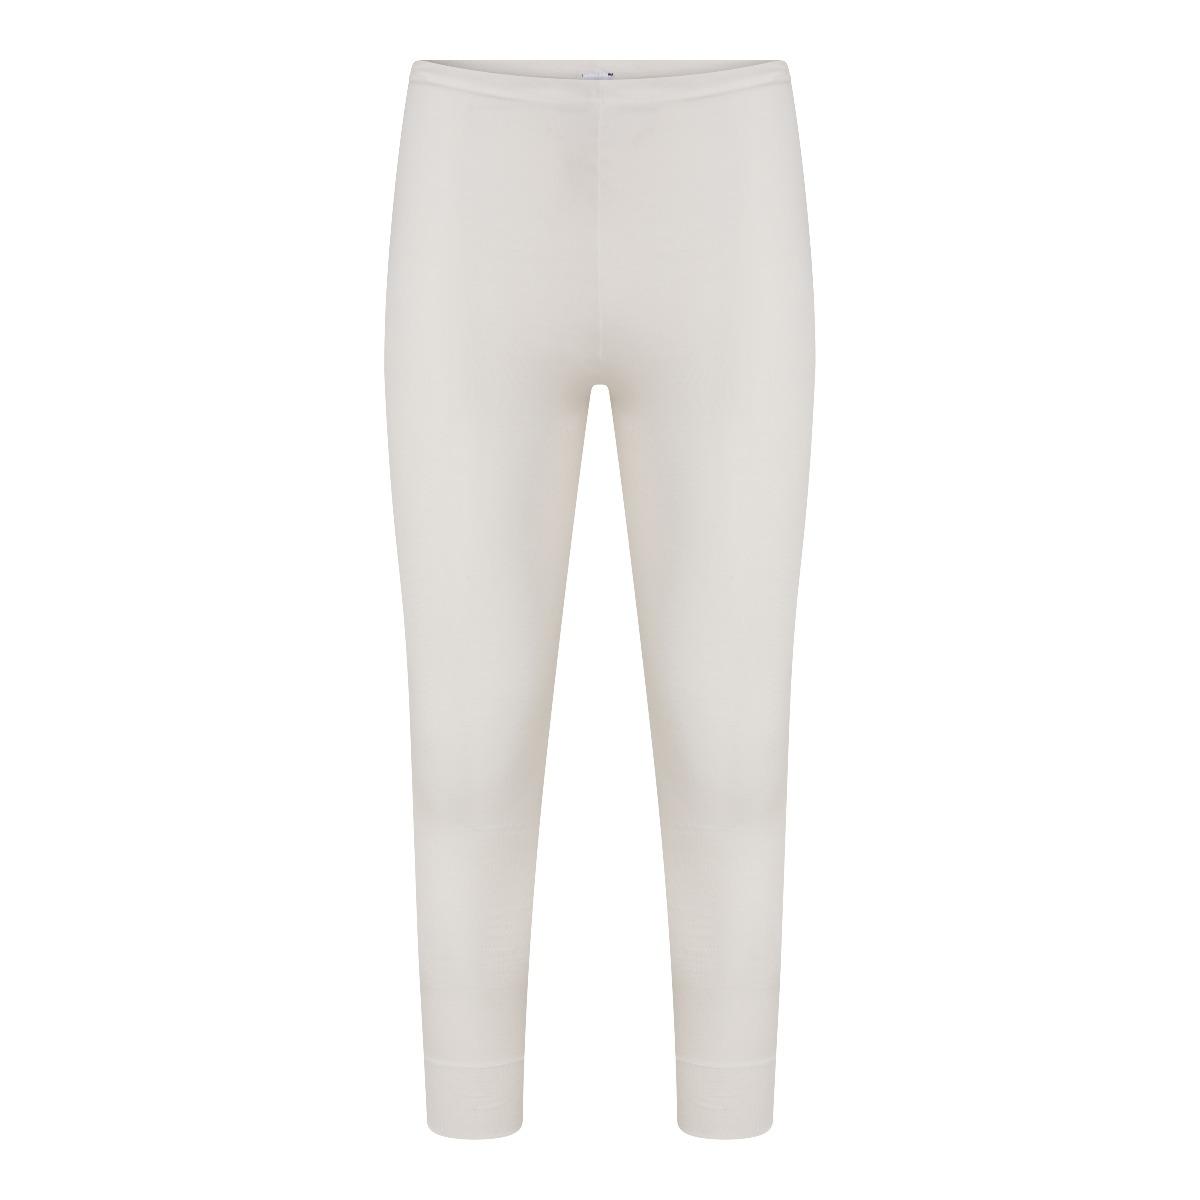 Beeren Thermo Unisex Pantalon Wolwit XL